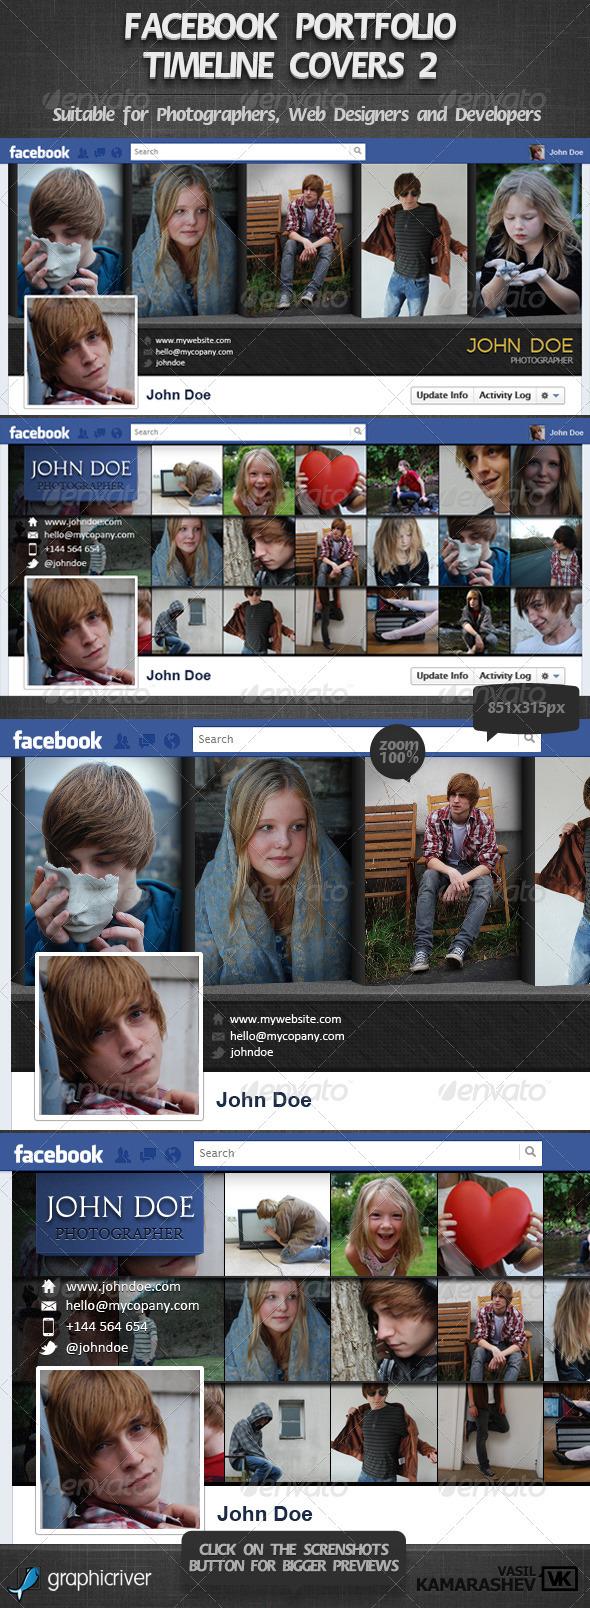 GraphicRiver Facebook Portfolio Timeline Covers 2 2473860